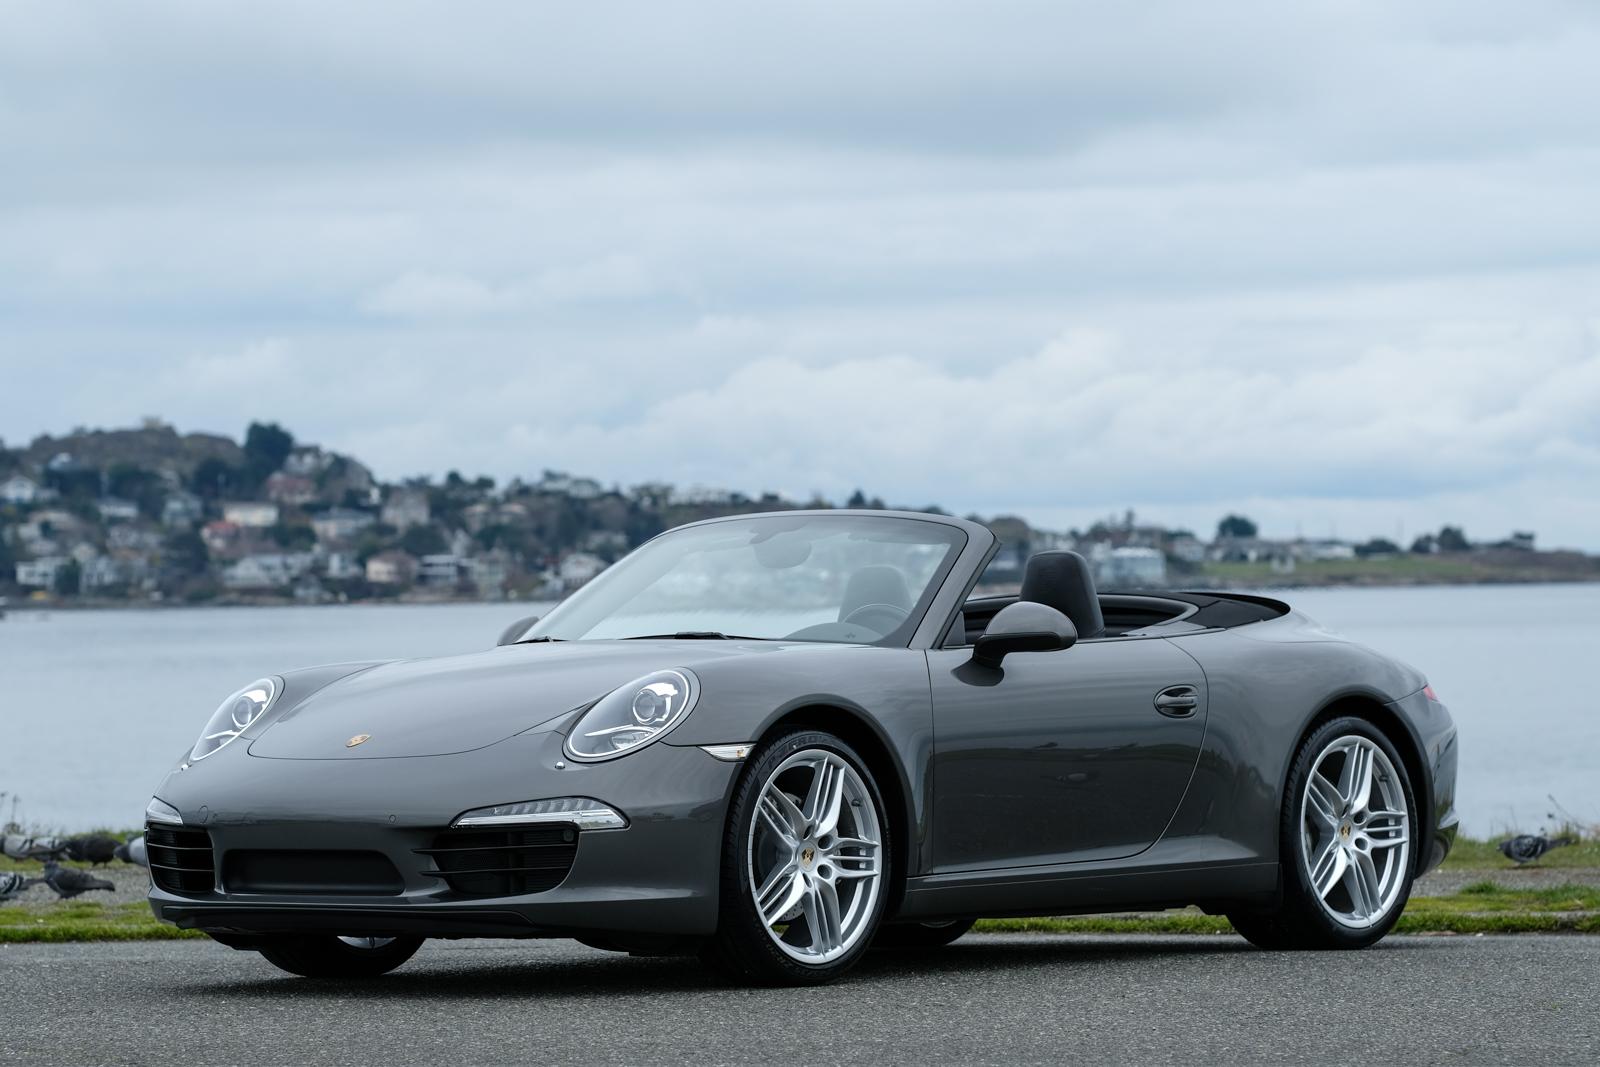 2012 Porsche 911 Carrera Cabriolet PDK for sale